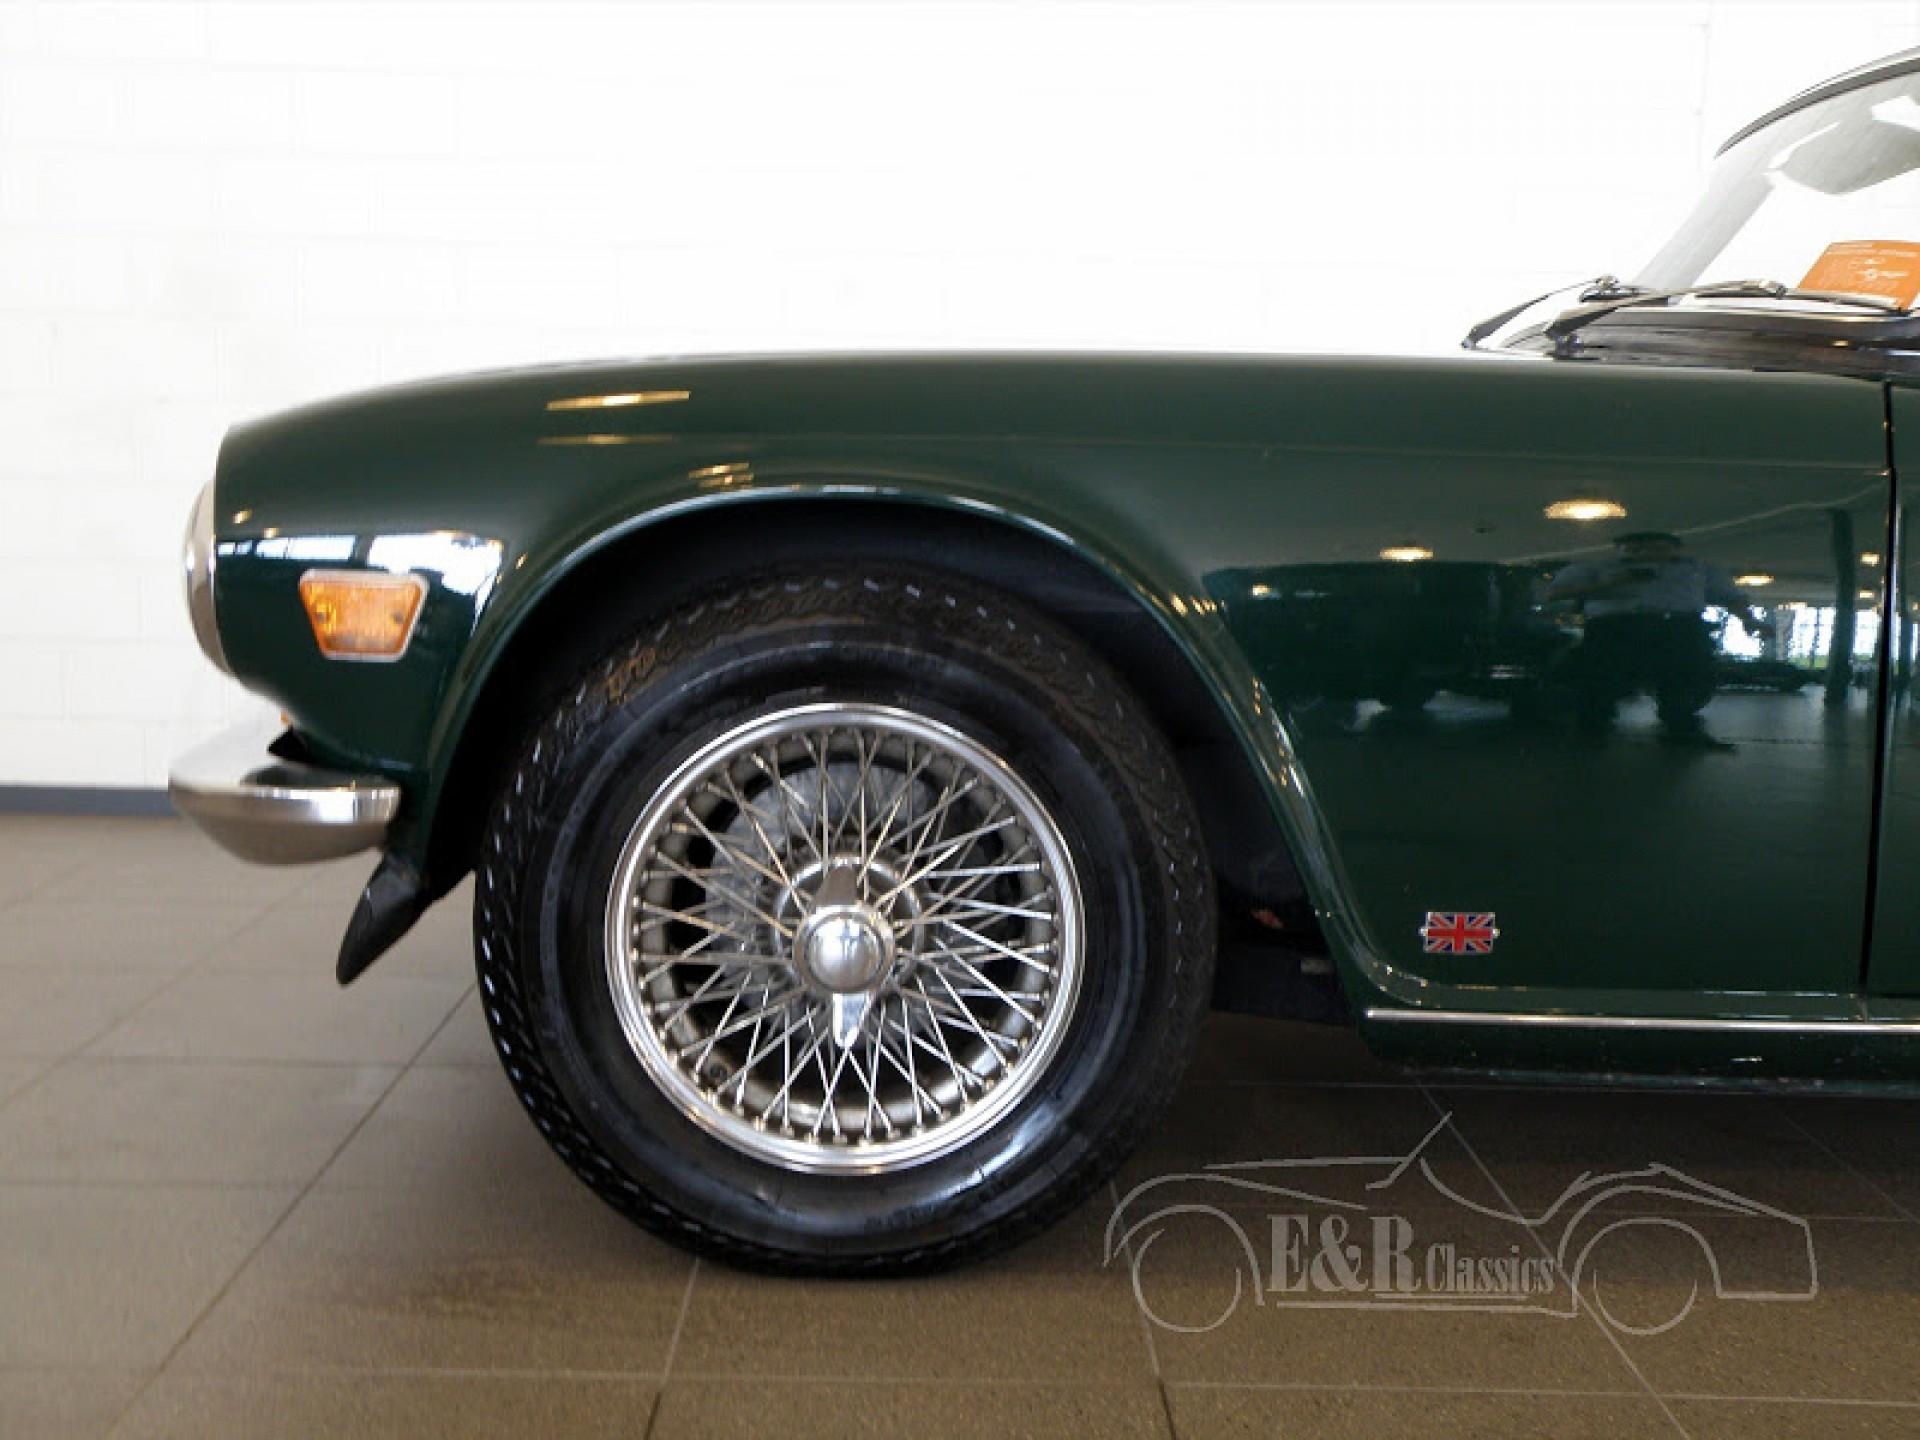 Triumph Classic Cars | Triumph oldtimers for sale at E & R Classic Cars!